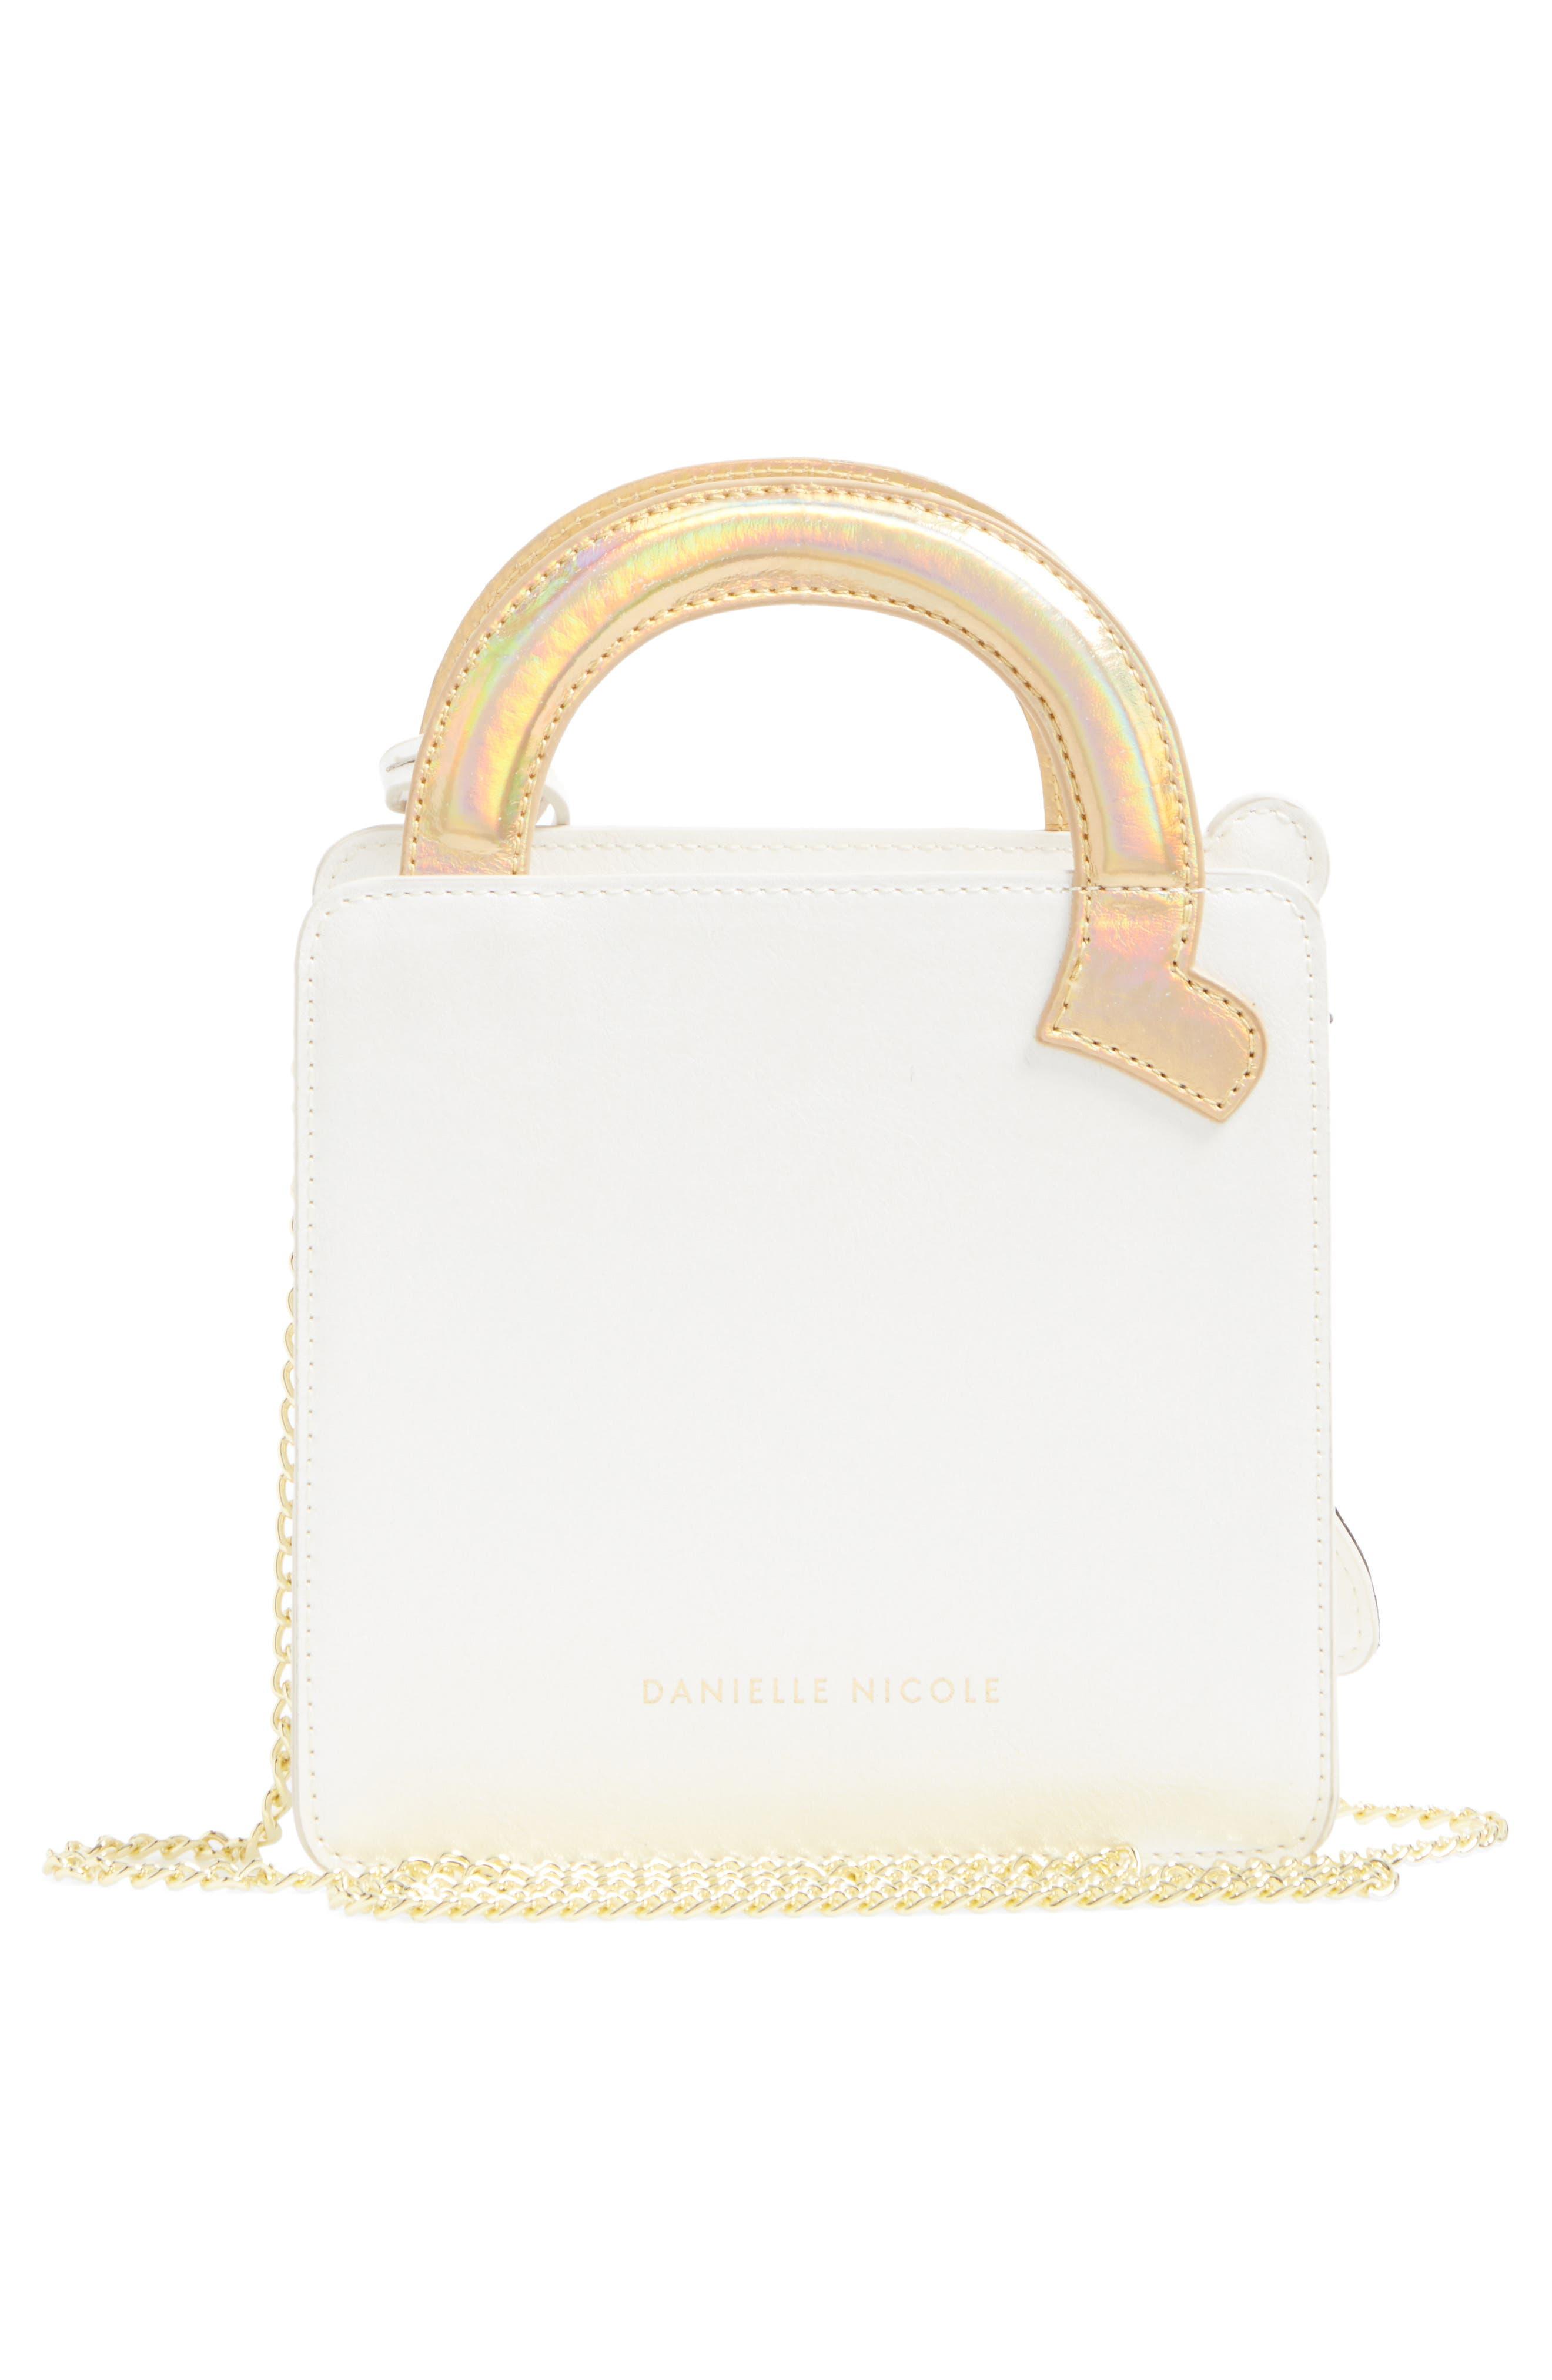 DANIELLE NICOLE,                             x Disney<sup>®</sup> Mrs. Potts & Chip Faux Leather Crossbody Bag,                             Alternate thumbnail 3, color,                             040